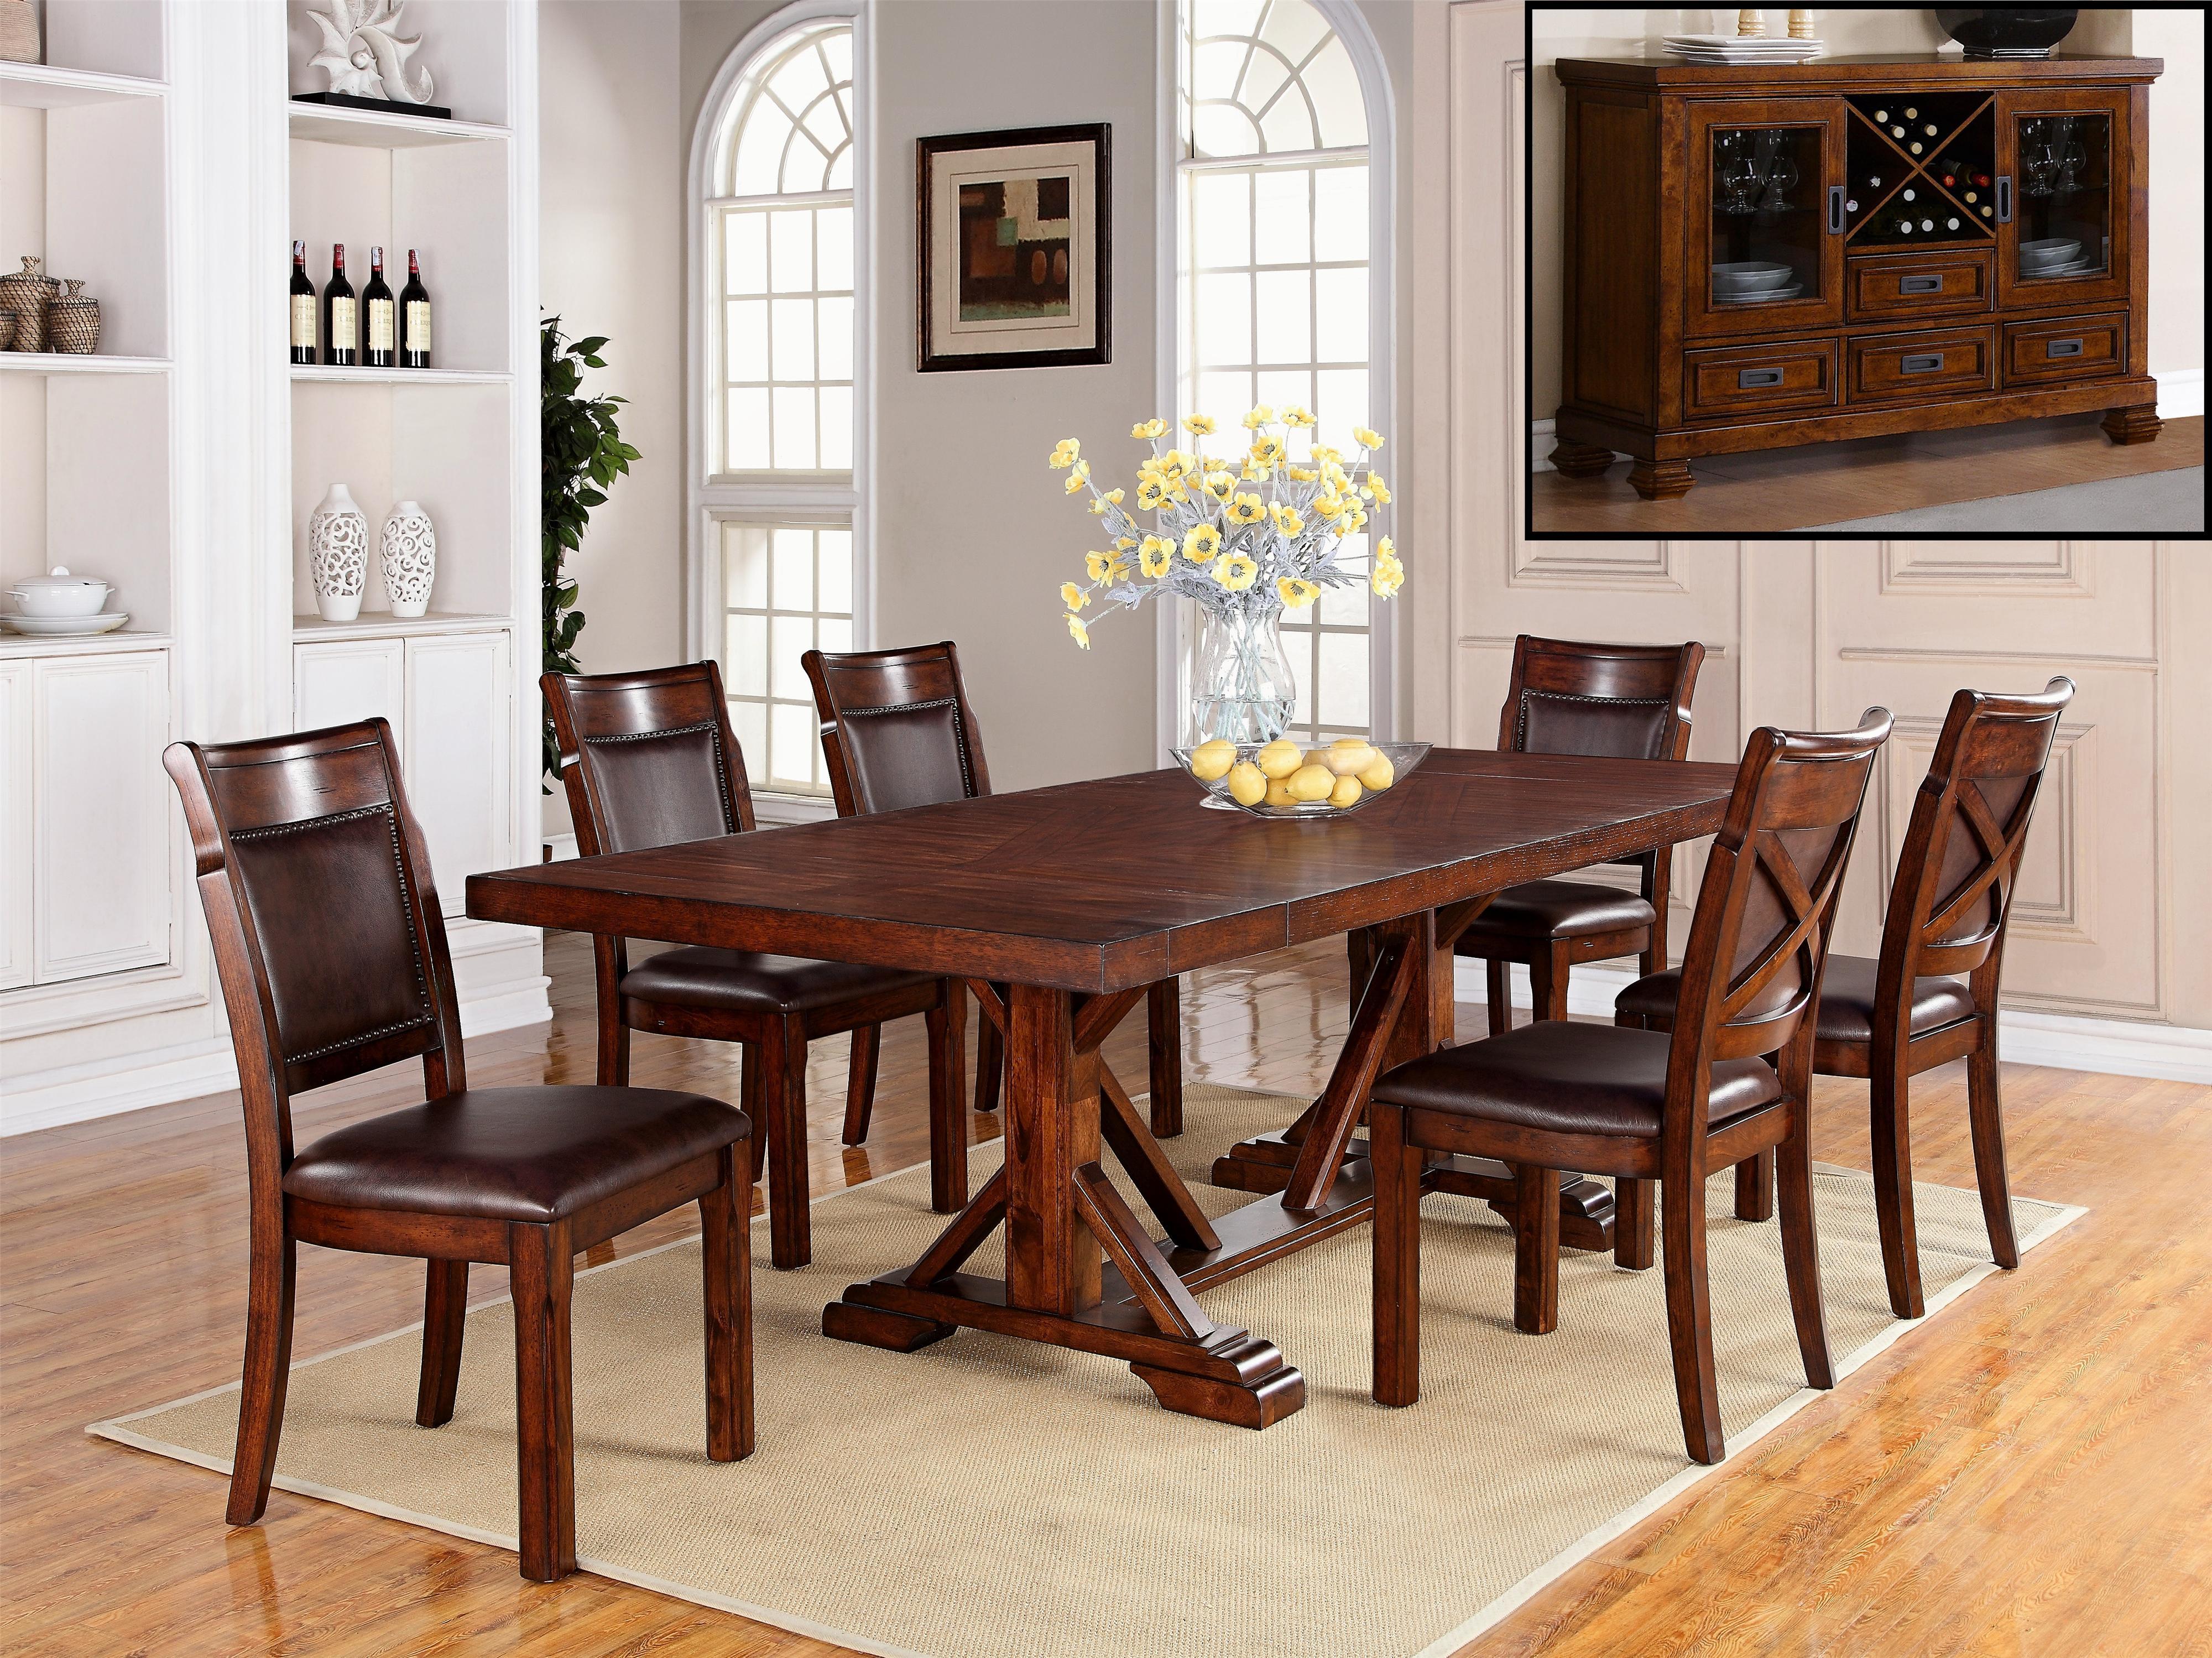 Adirondack Formal Dining Room Group by Warehouse M at Pilgrim Furniture City